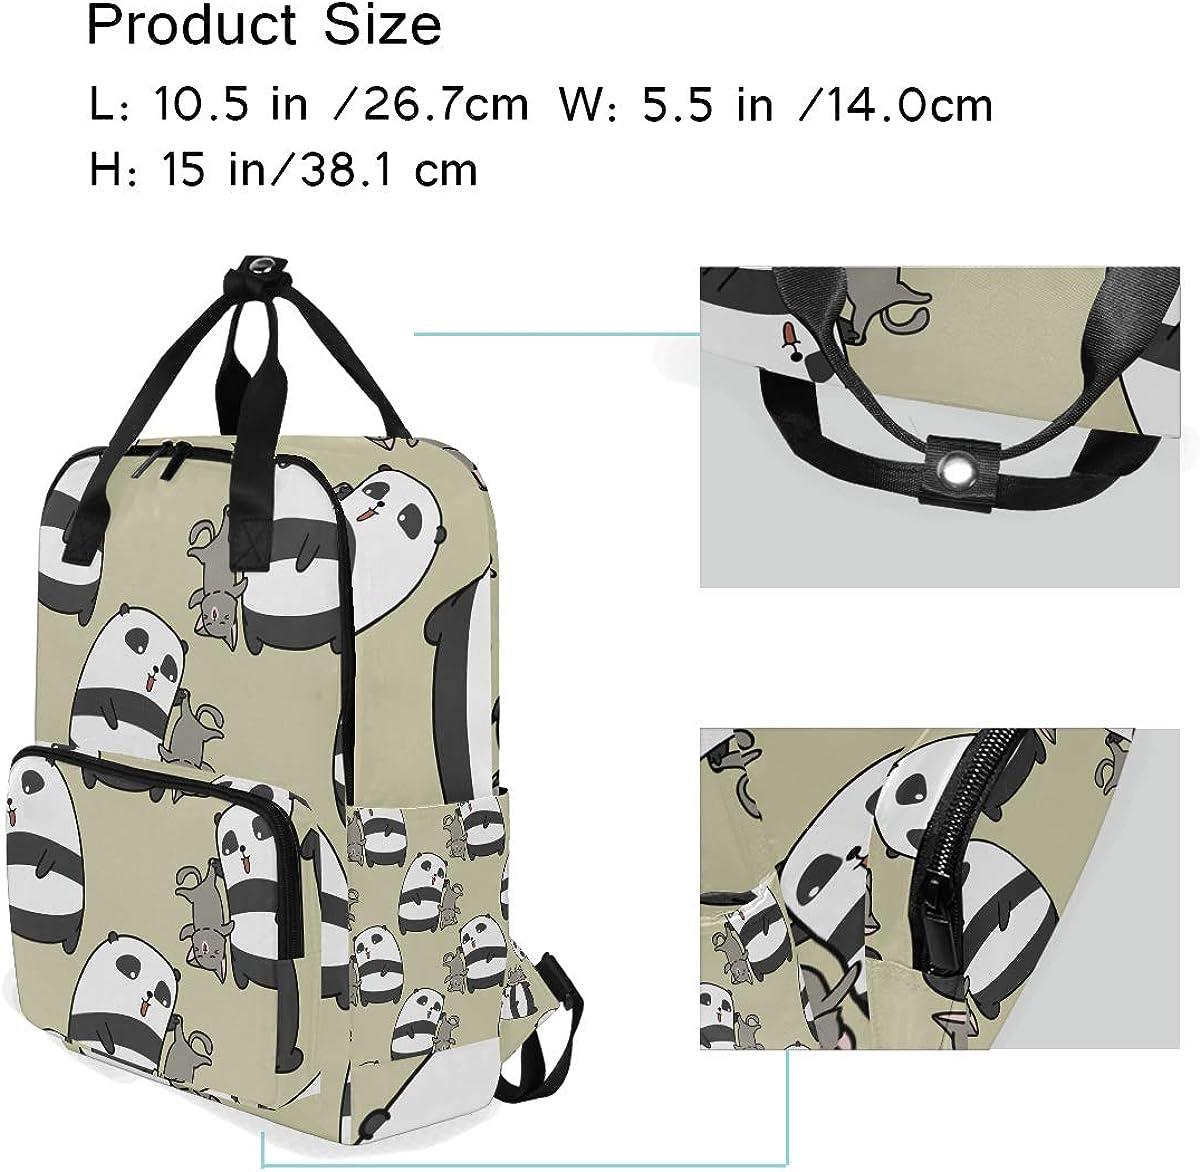 Cute Panda Casual Travel Daypack School Backpack for Women Large Diaper Bag Rucksack Bookbag for College Fits 14inch Laptop Backpack